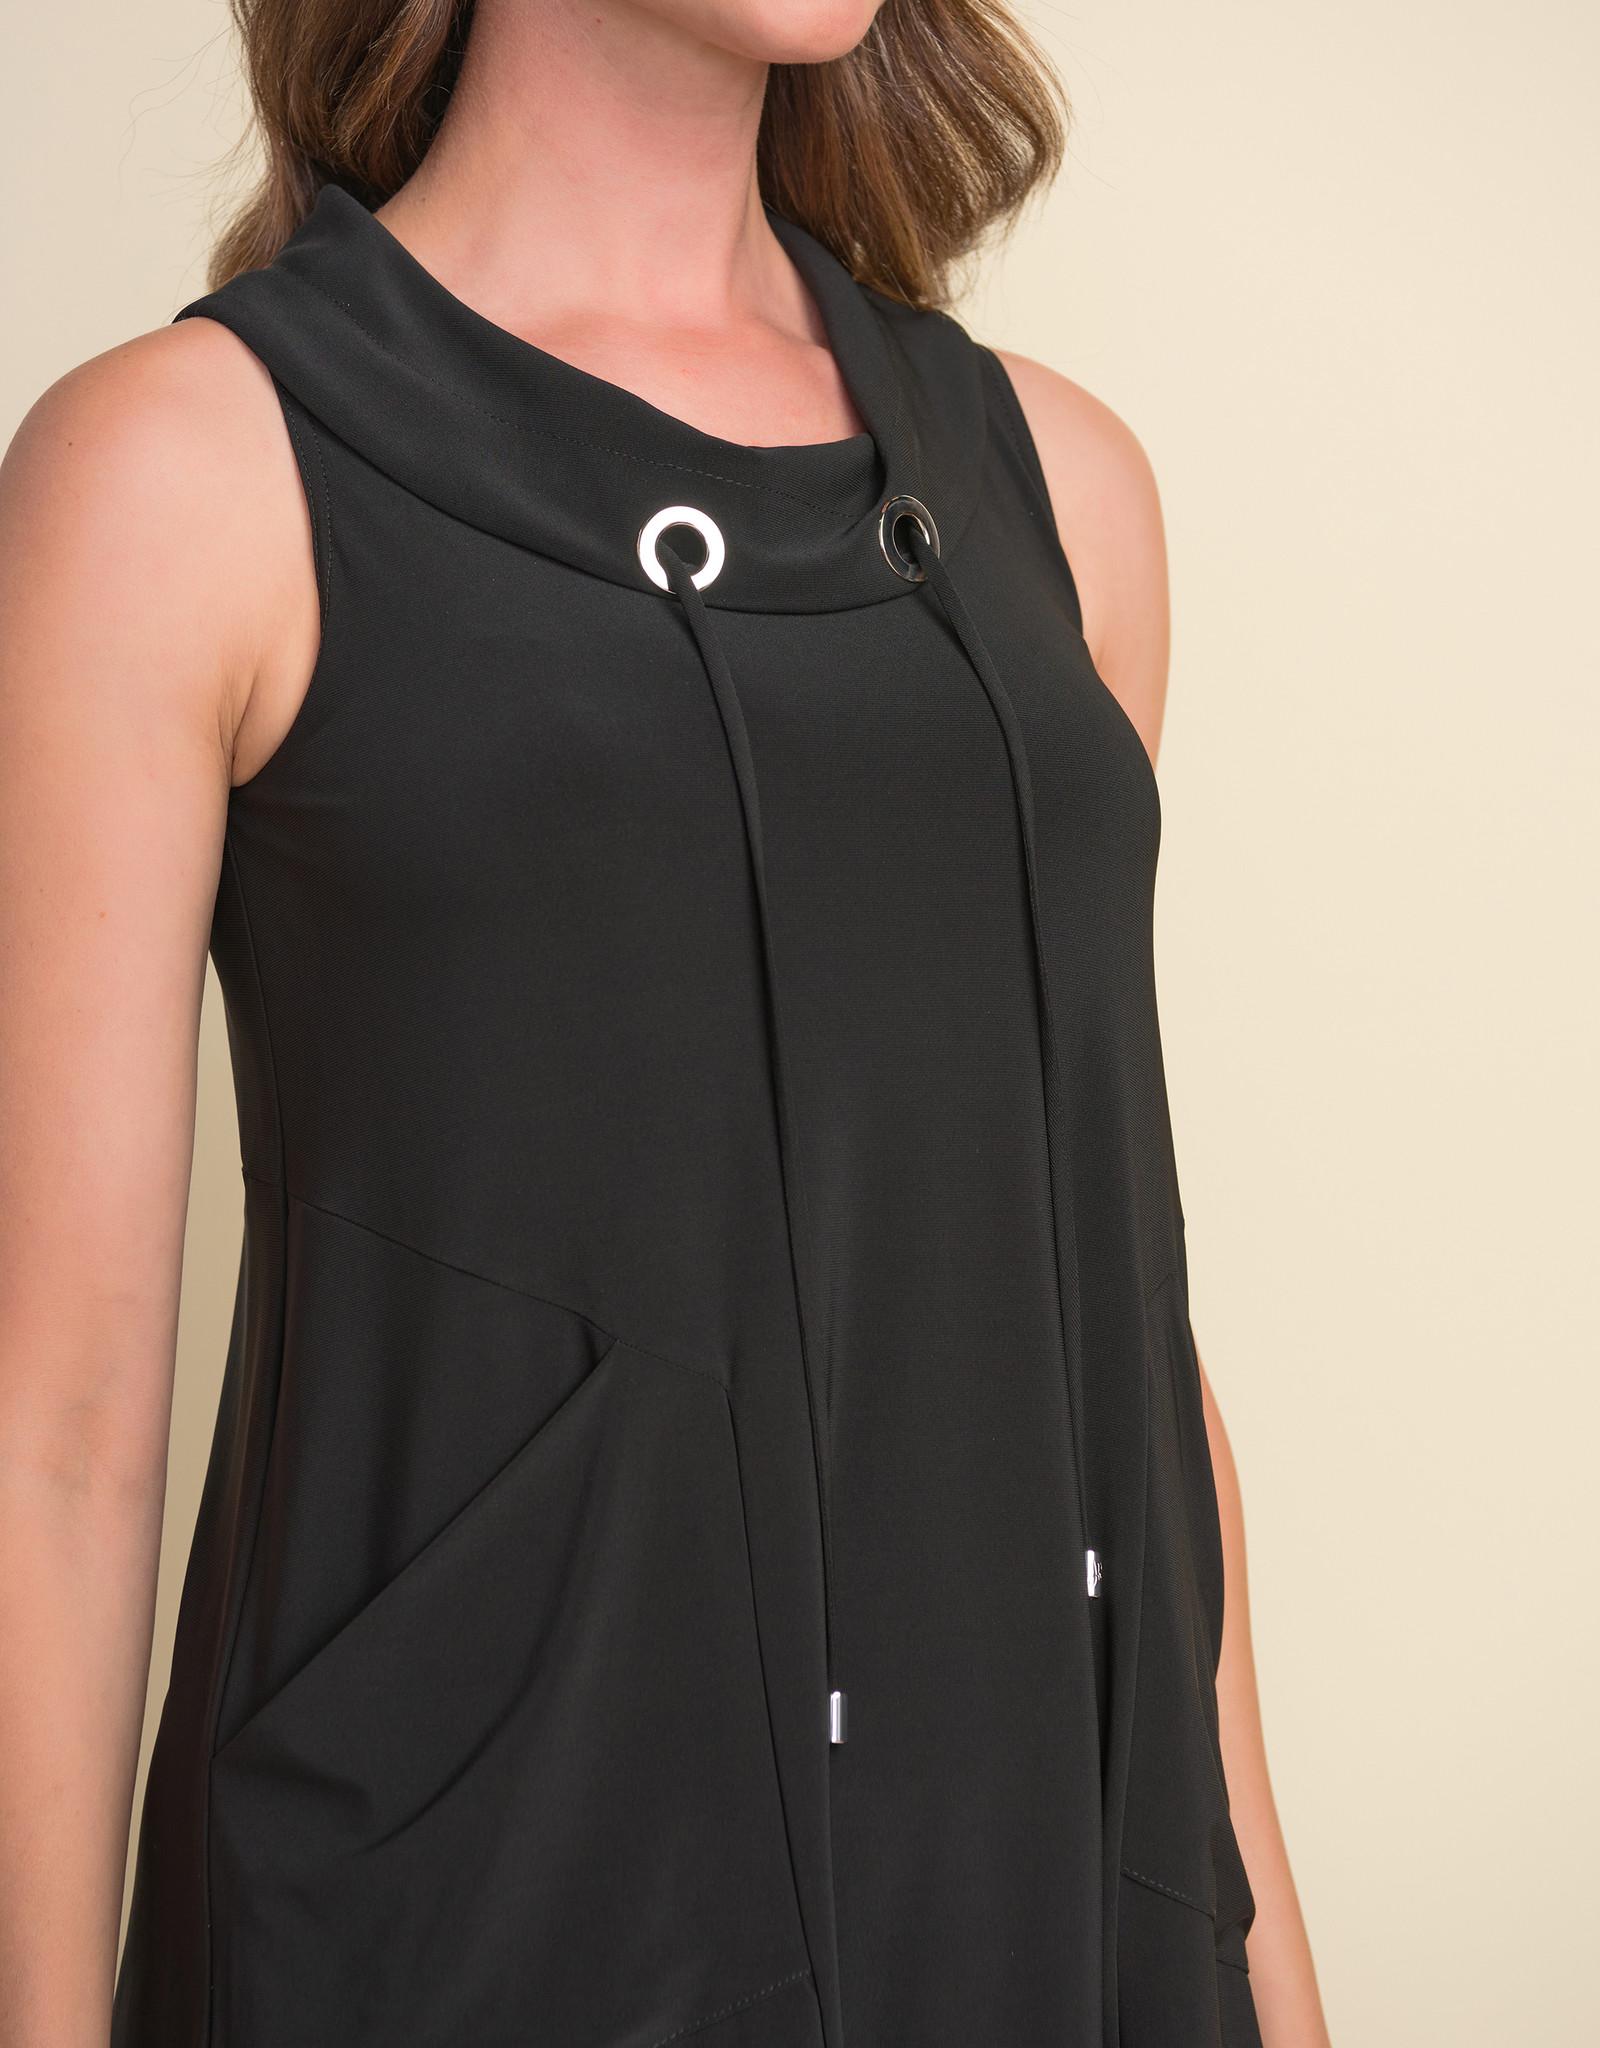 Joseph Ribkoff Joseph Ribkoff 212175 Sleeveless Tunic with Pockets and Round Collar